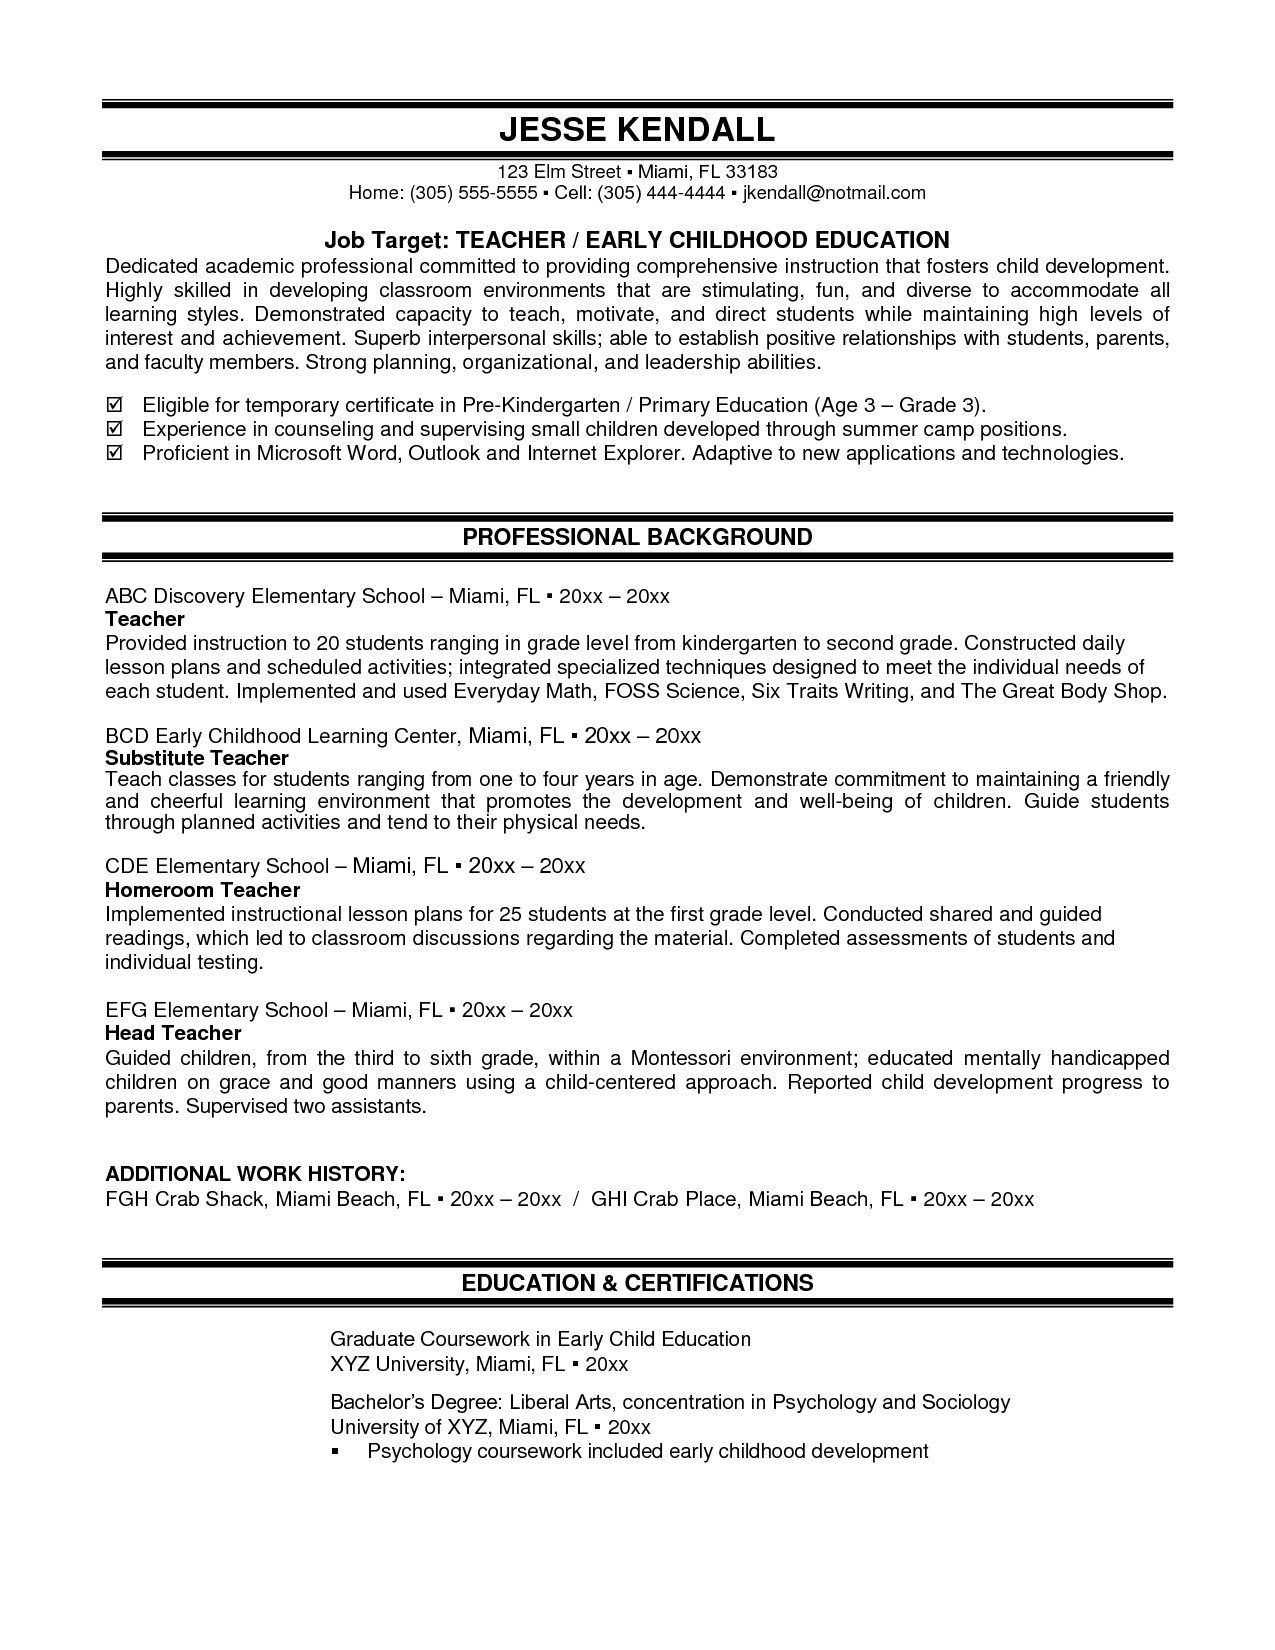 resume templates for montessori teacher resume examples